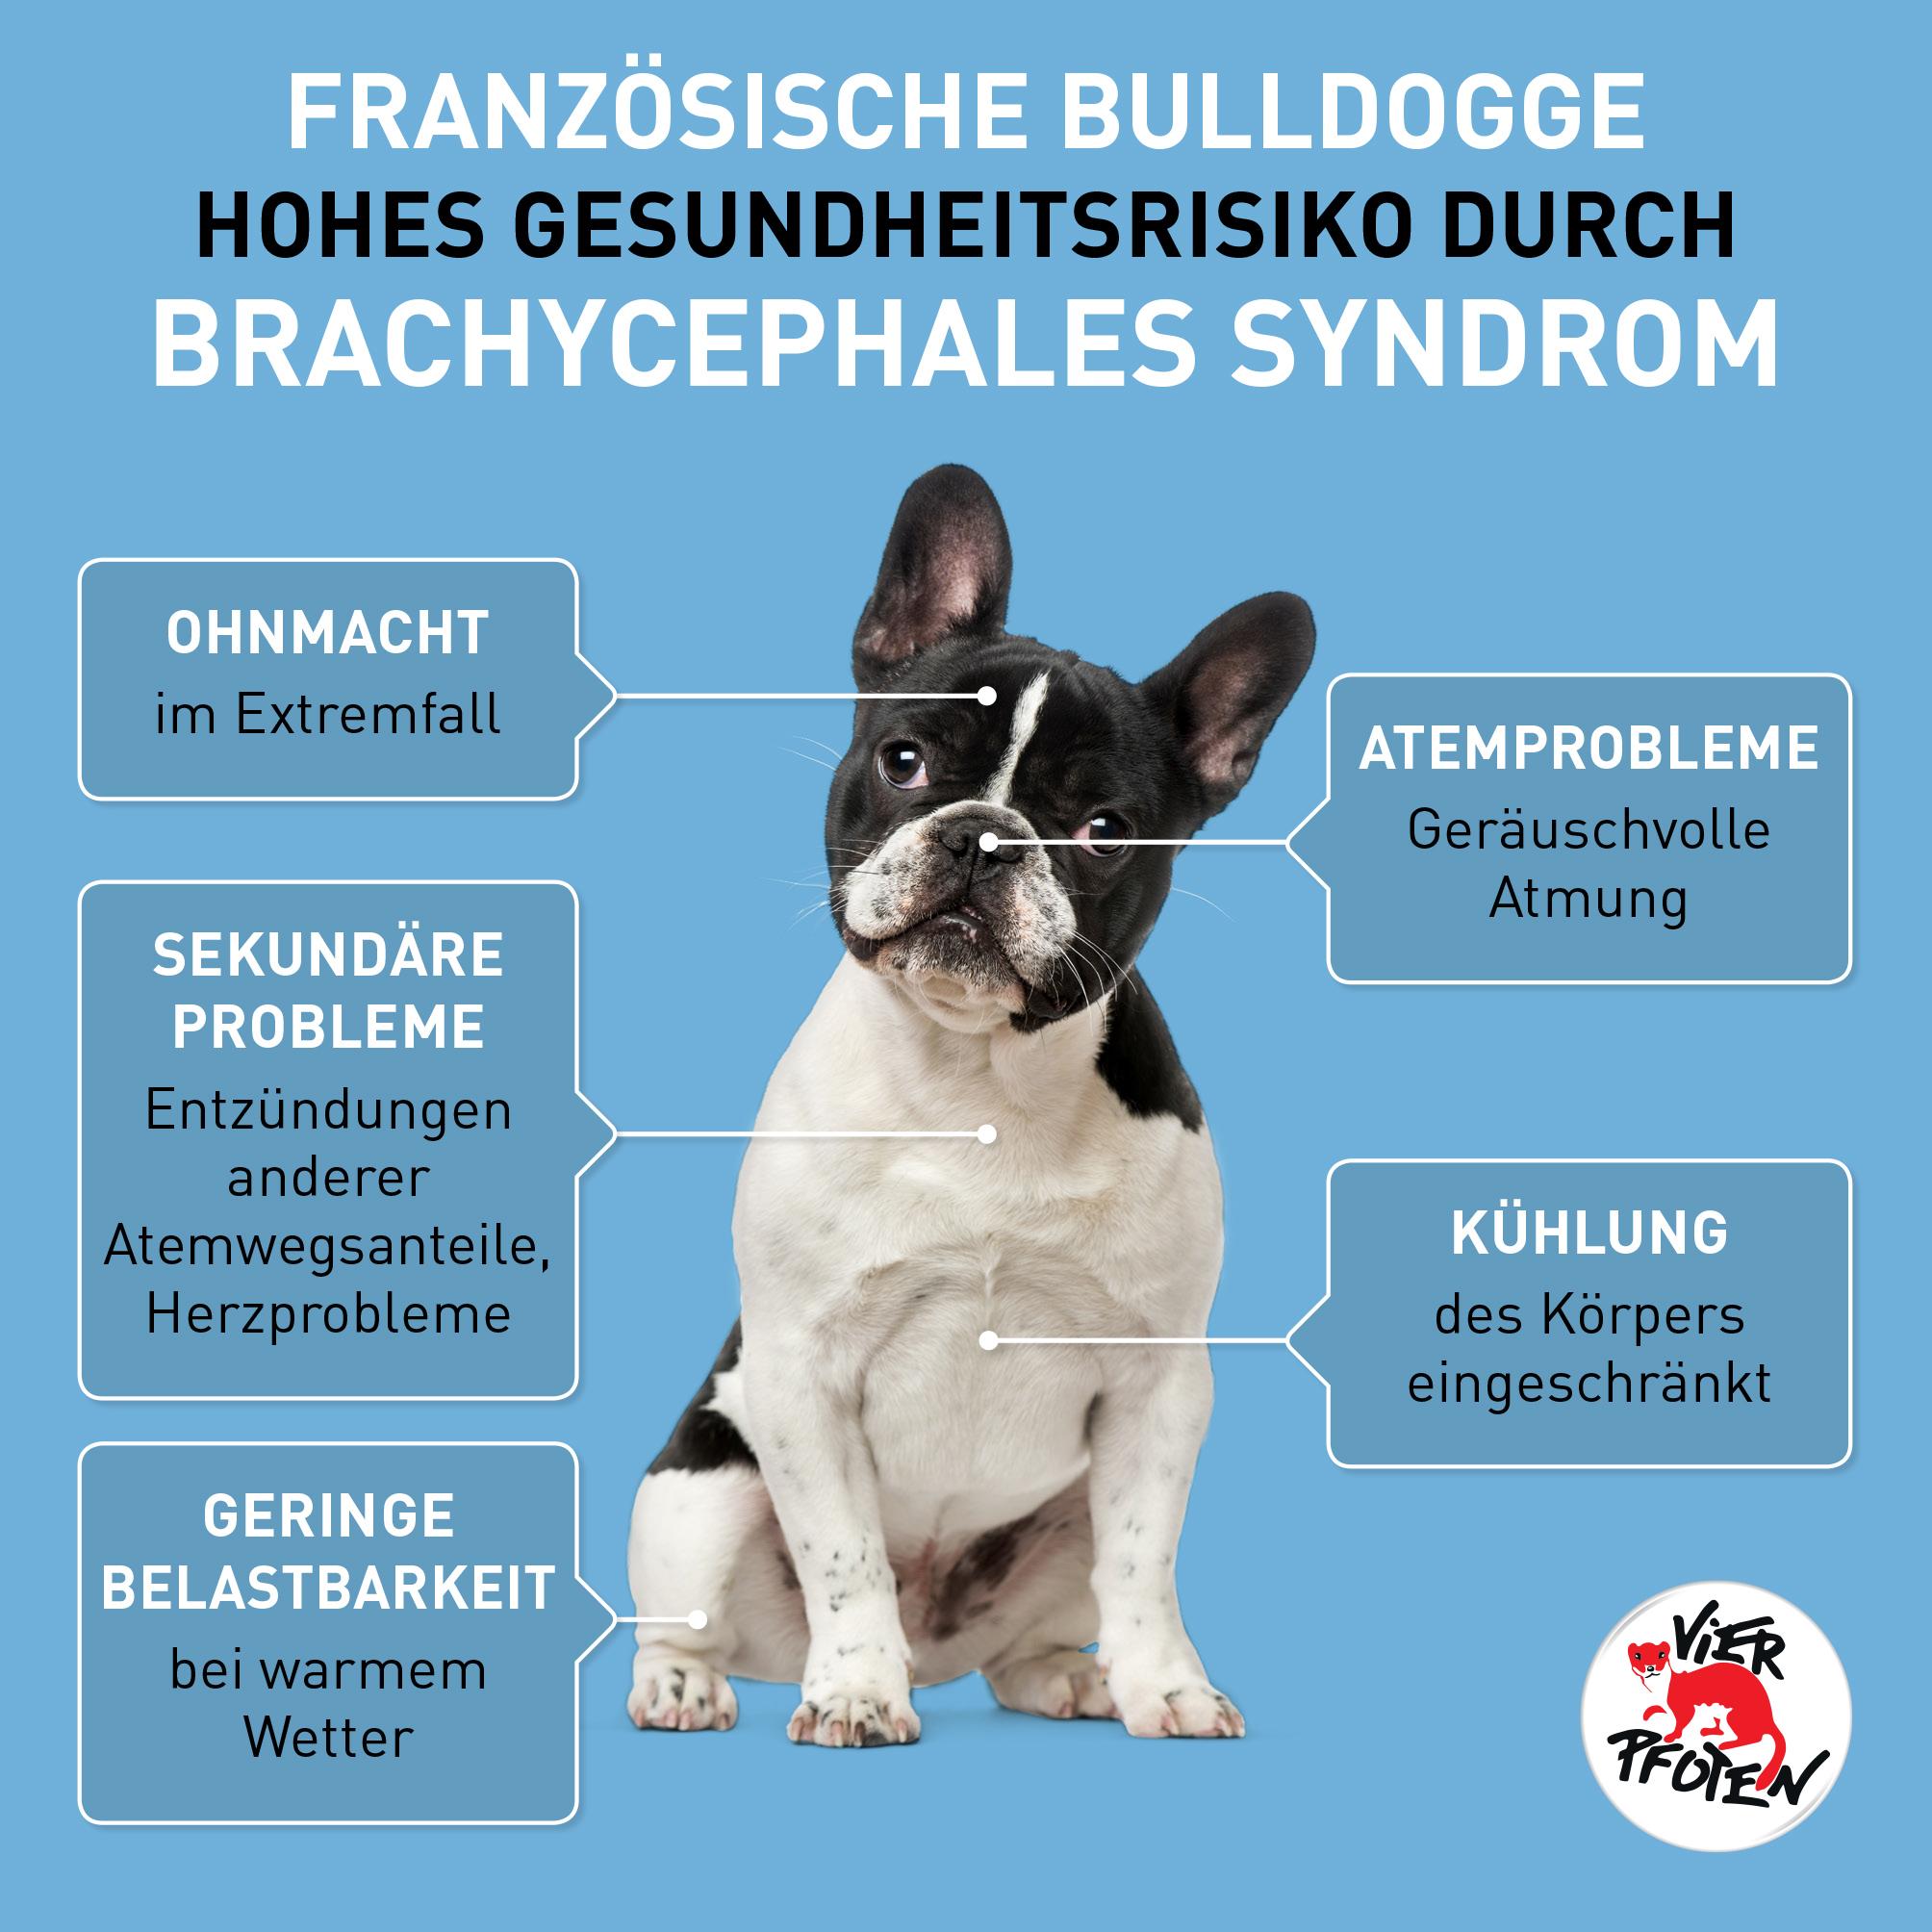 Französische Bulldogge: Hohes Risiko durch Brachycephales Syndrom